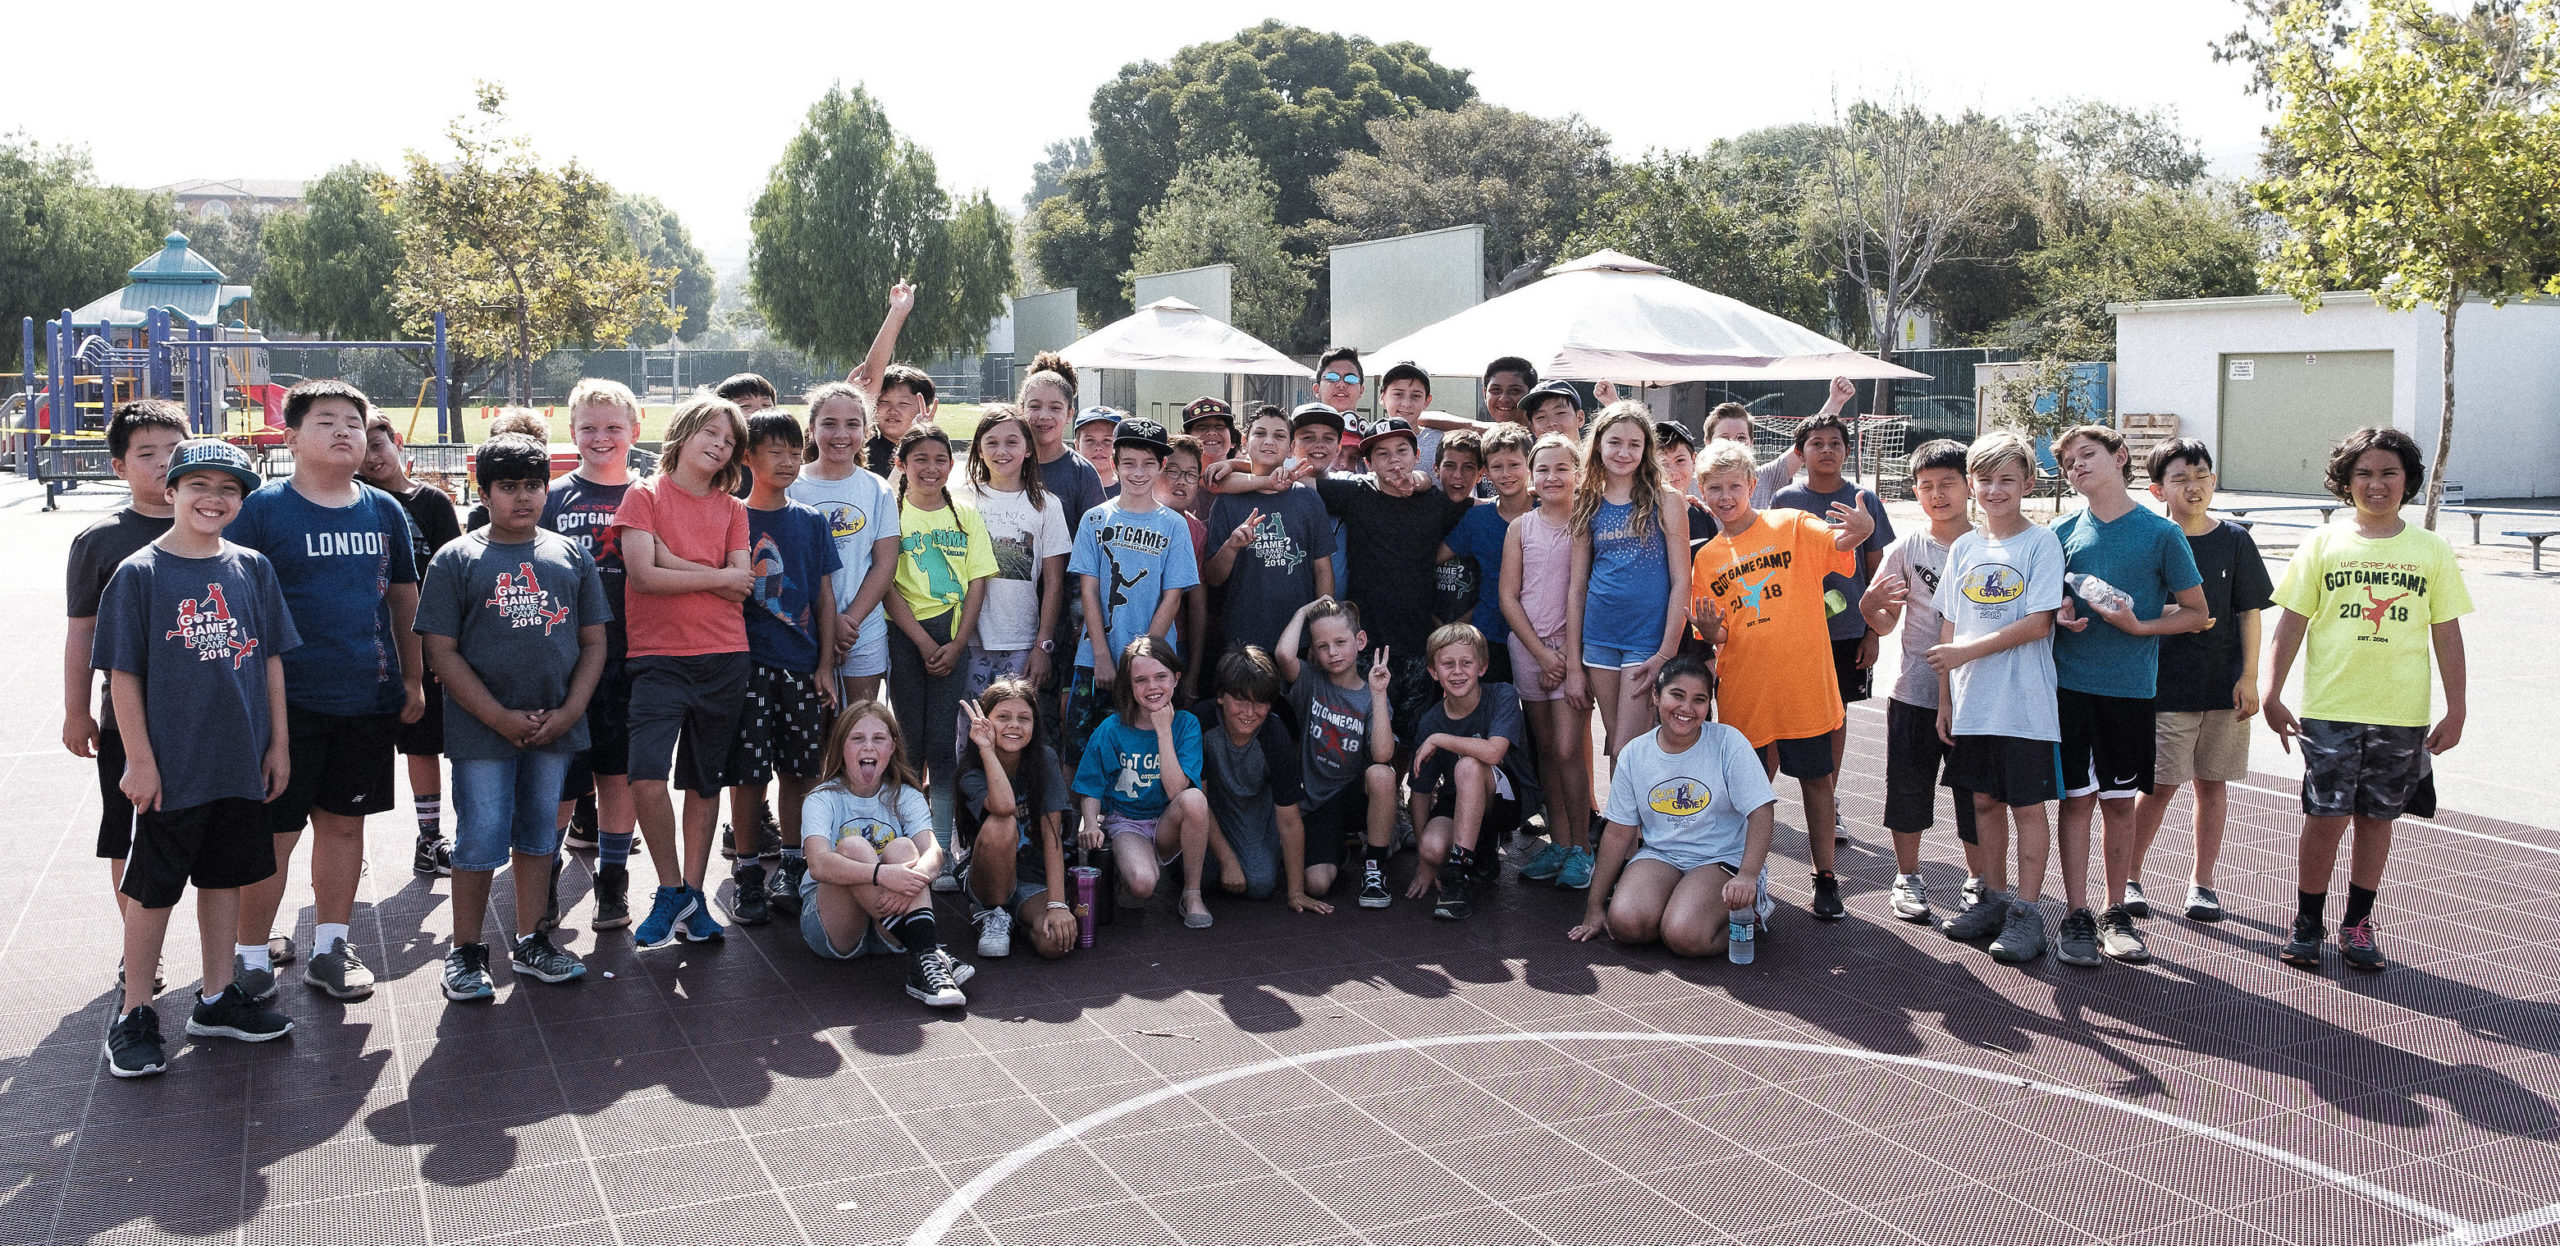 Got Game - Sherman Oaks Summer Camp - Image 1